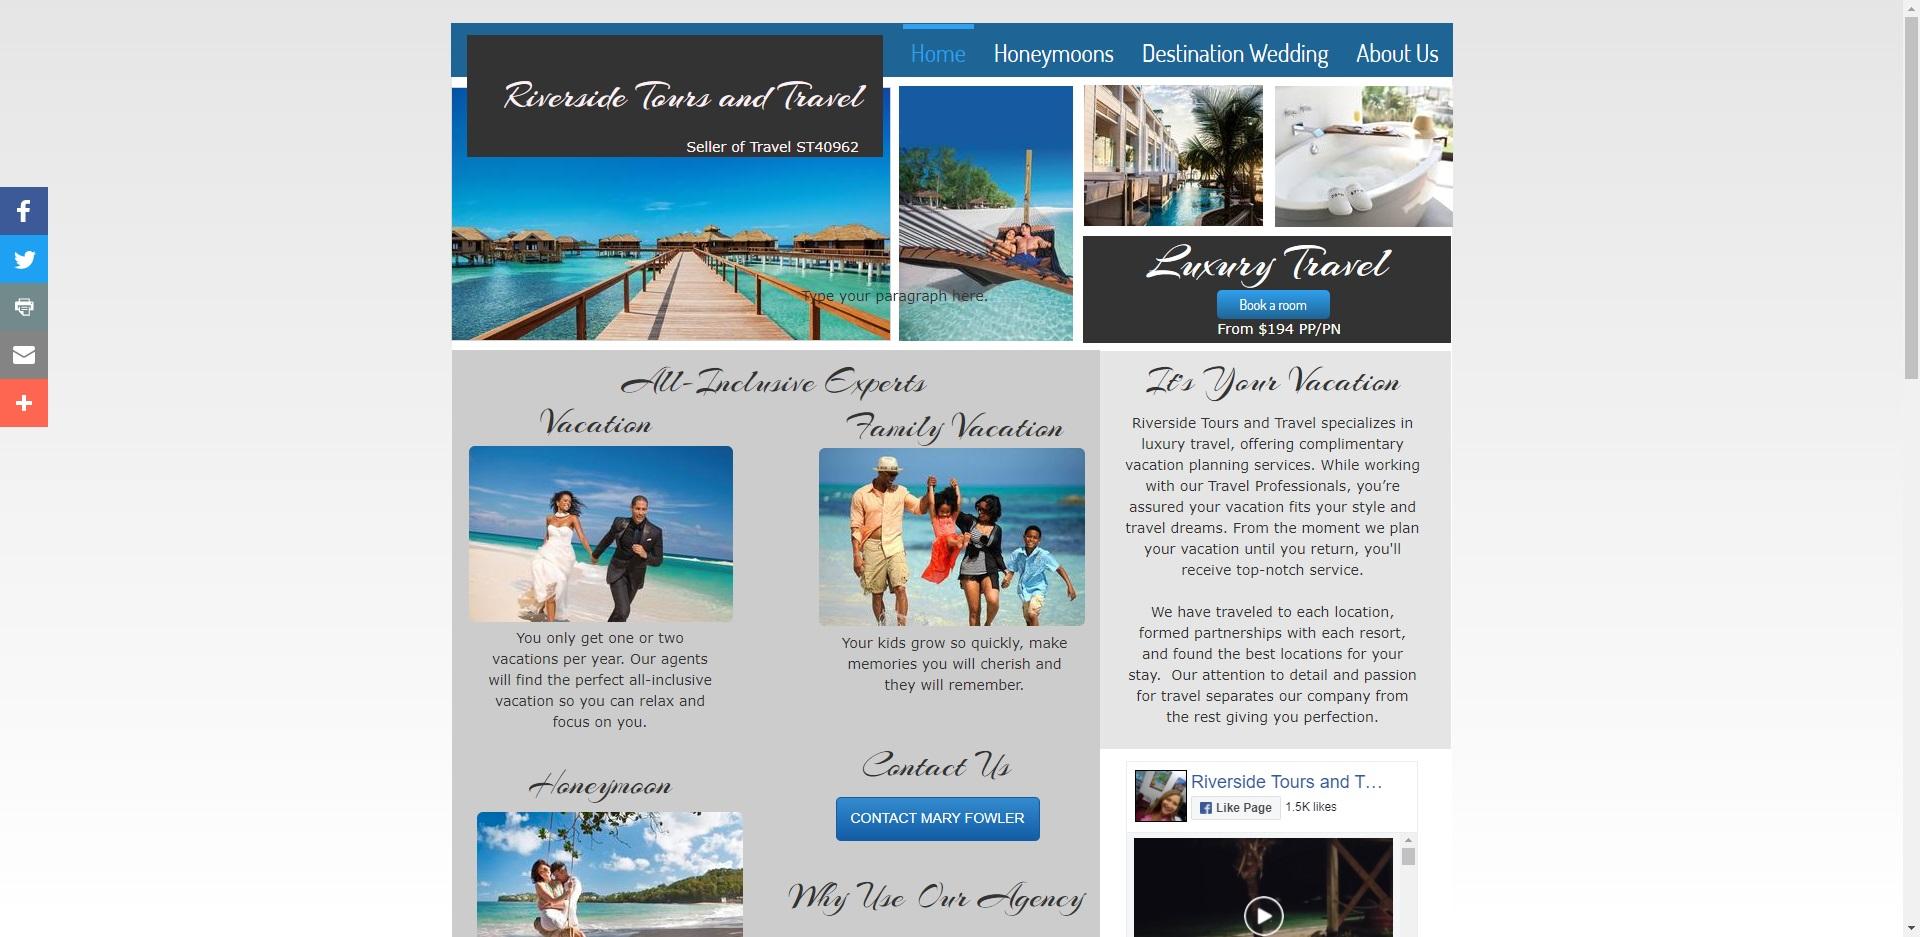 Best Travel Agents in Jacksonville